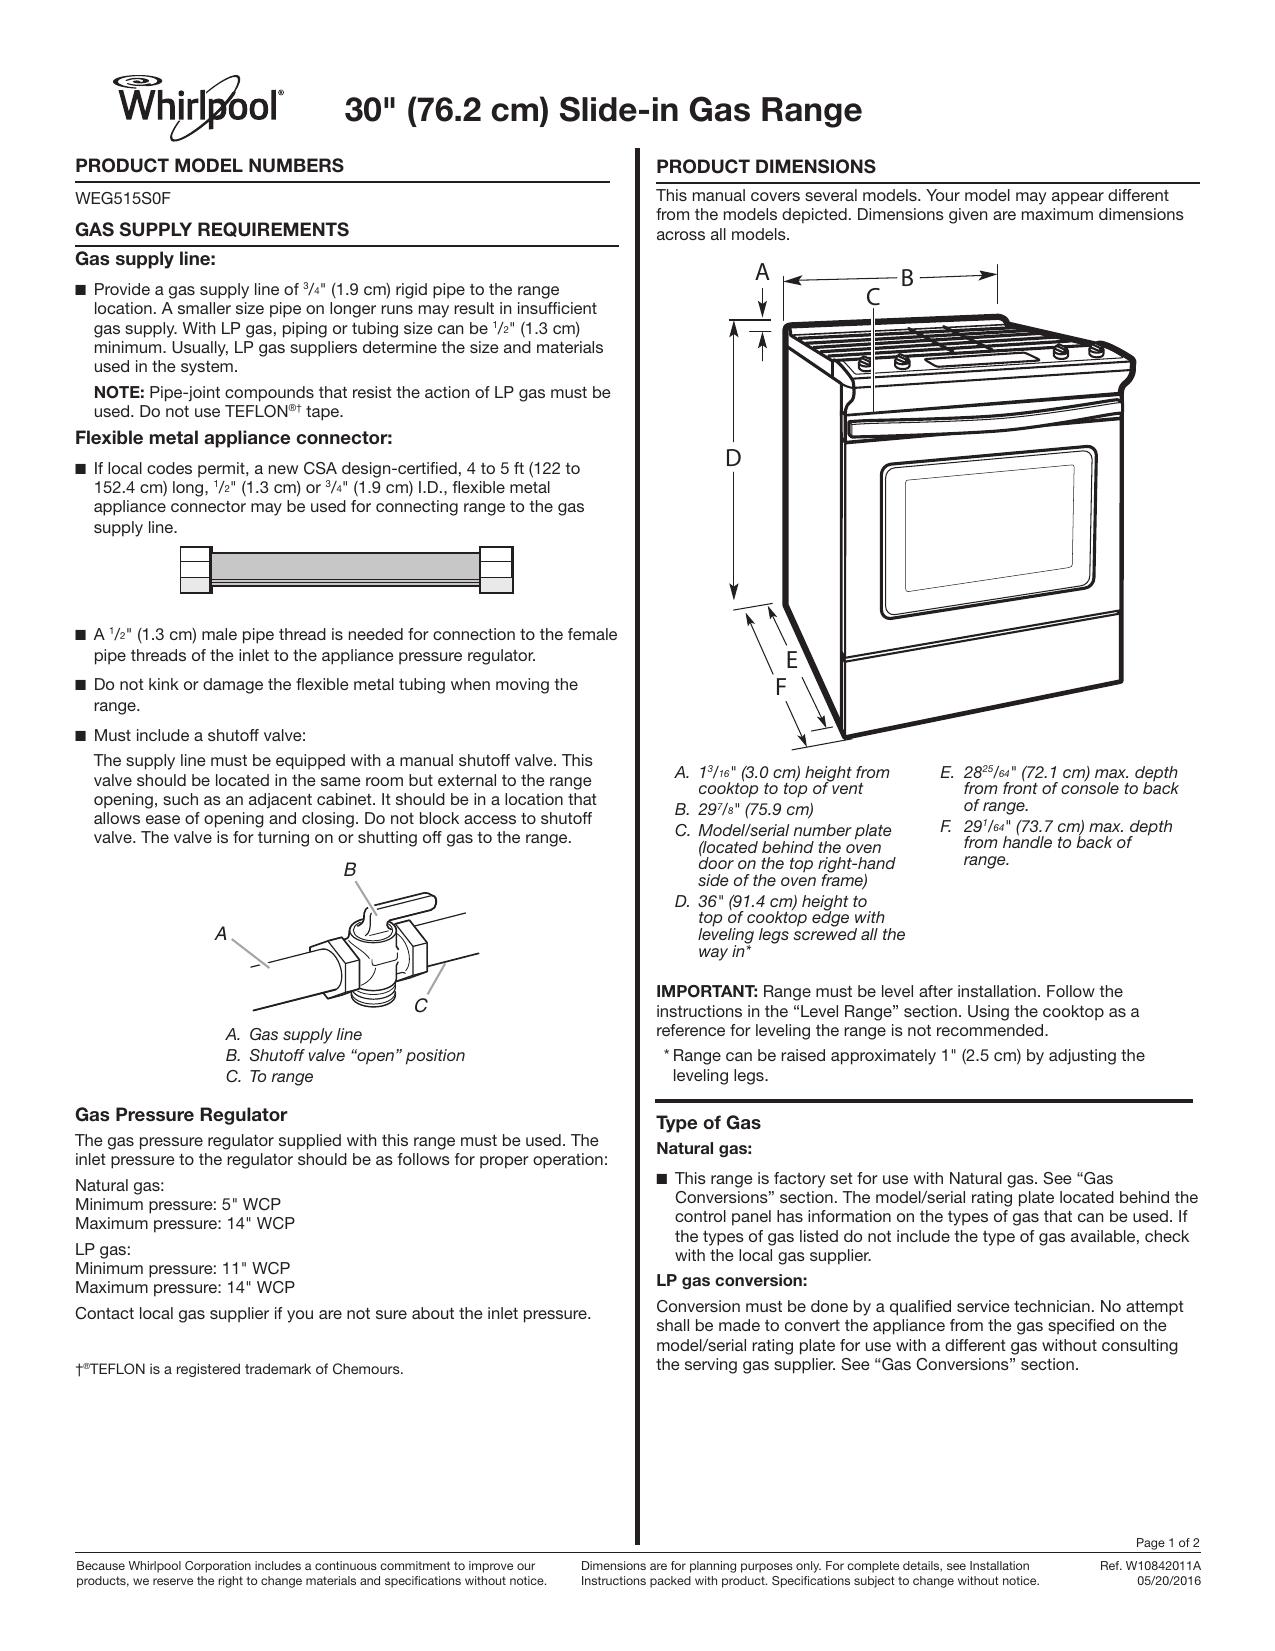 Whirlpool WEG515S0FS Dimension Guide   manualzz com